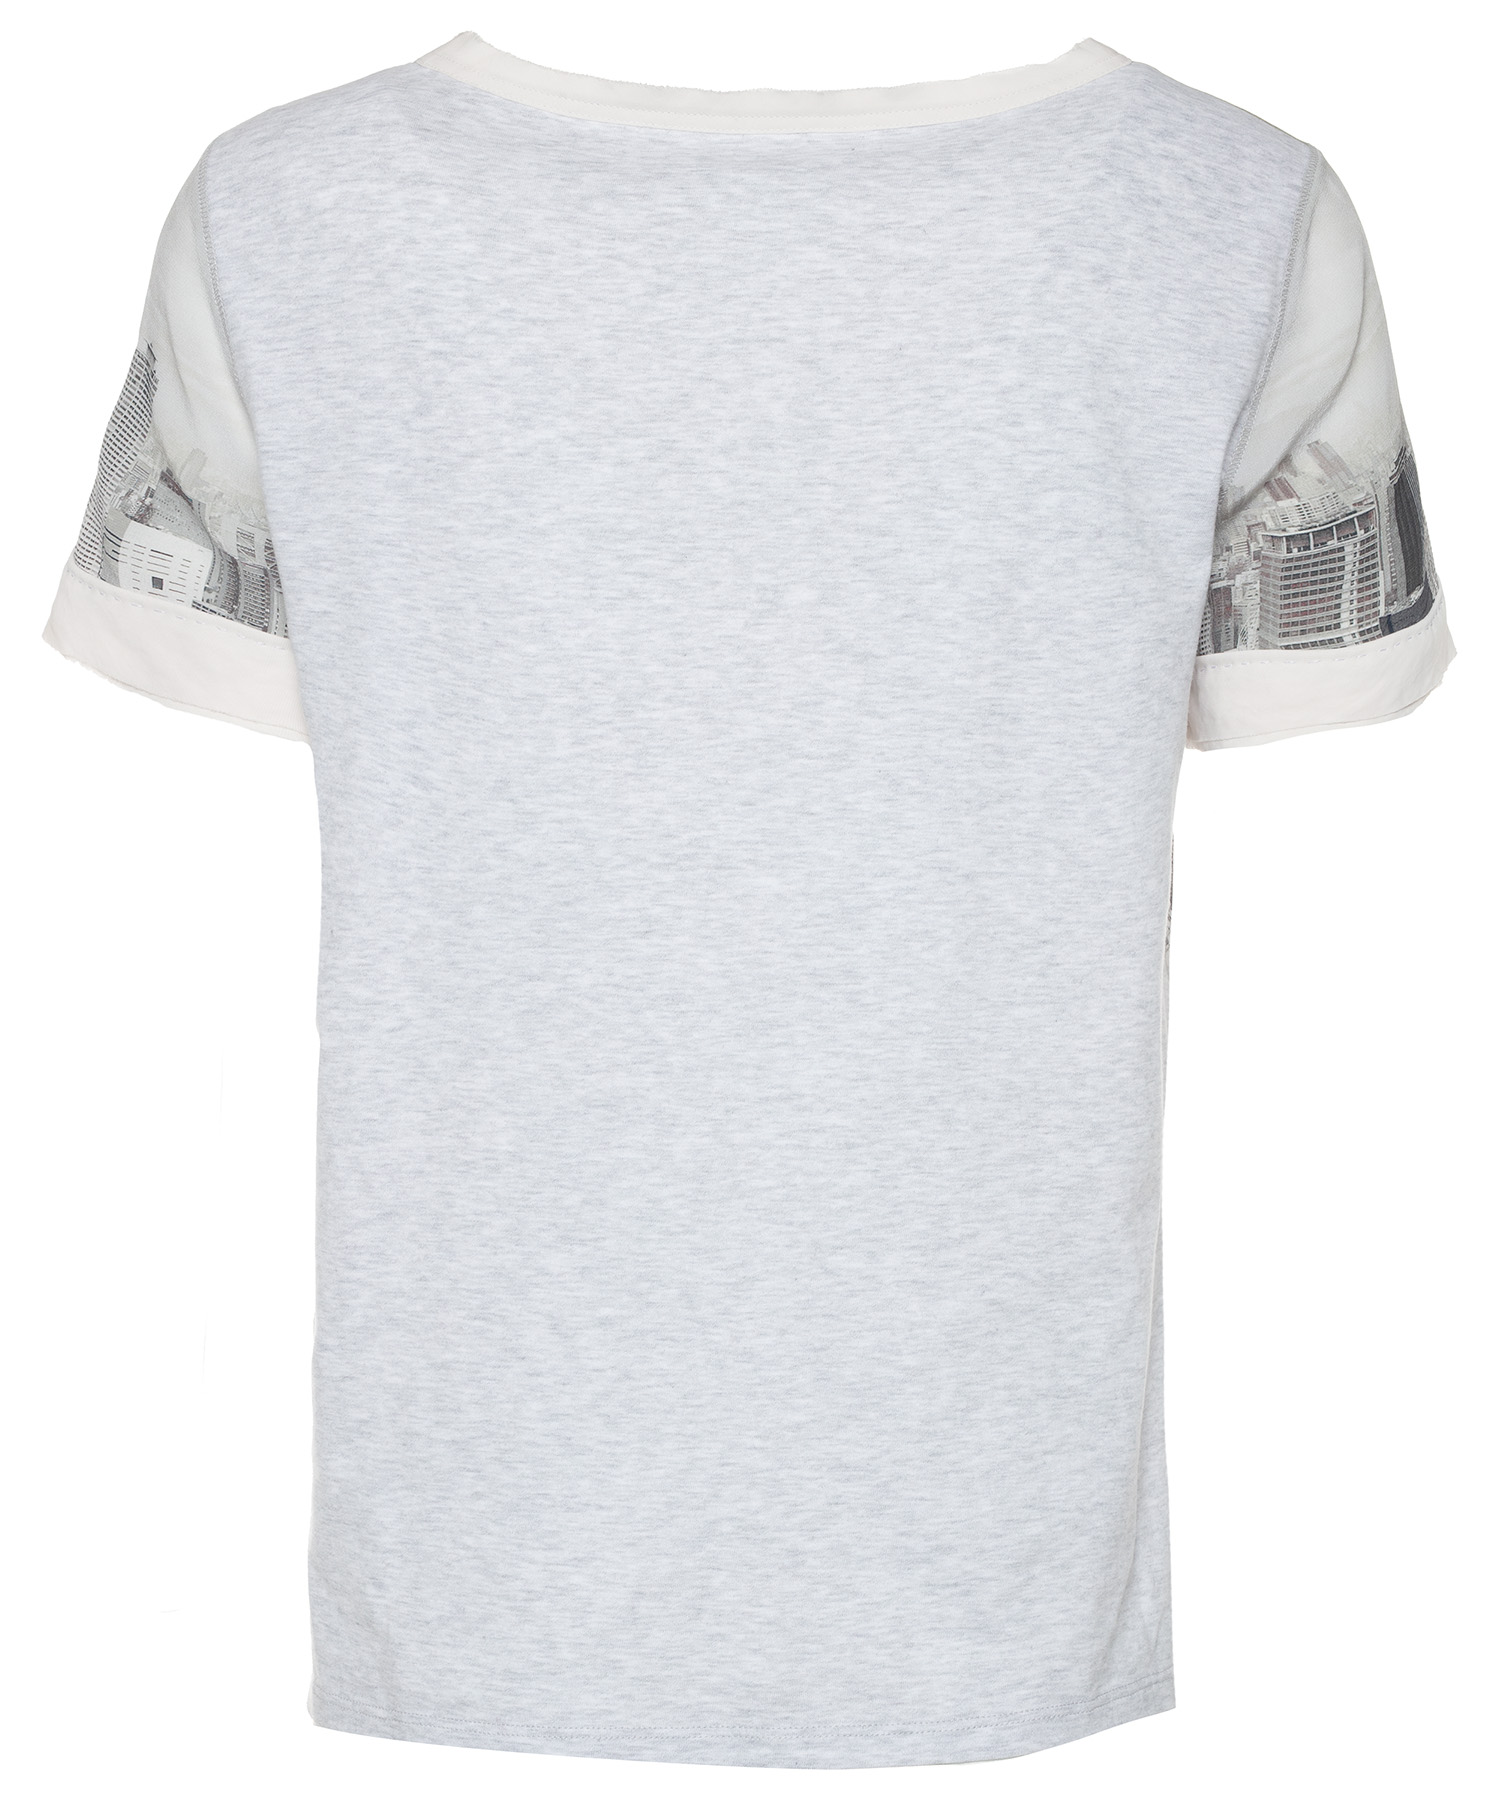 Marc Cain shirt fotoprint